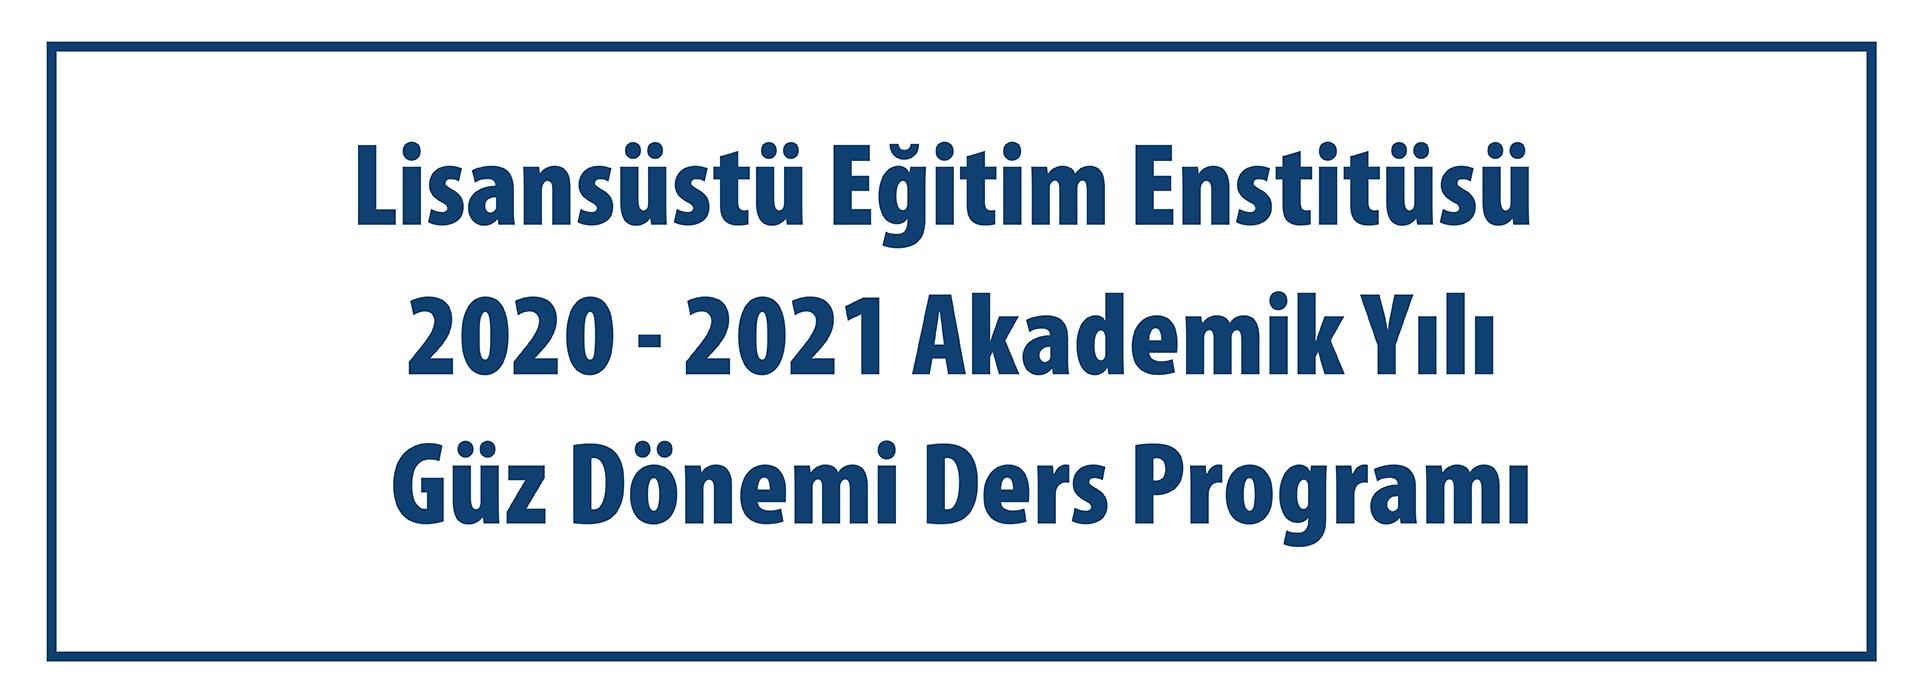 1920-700